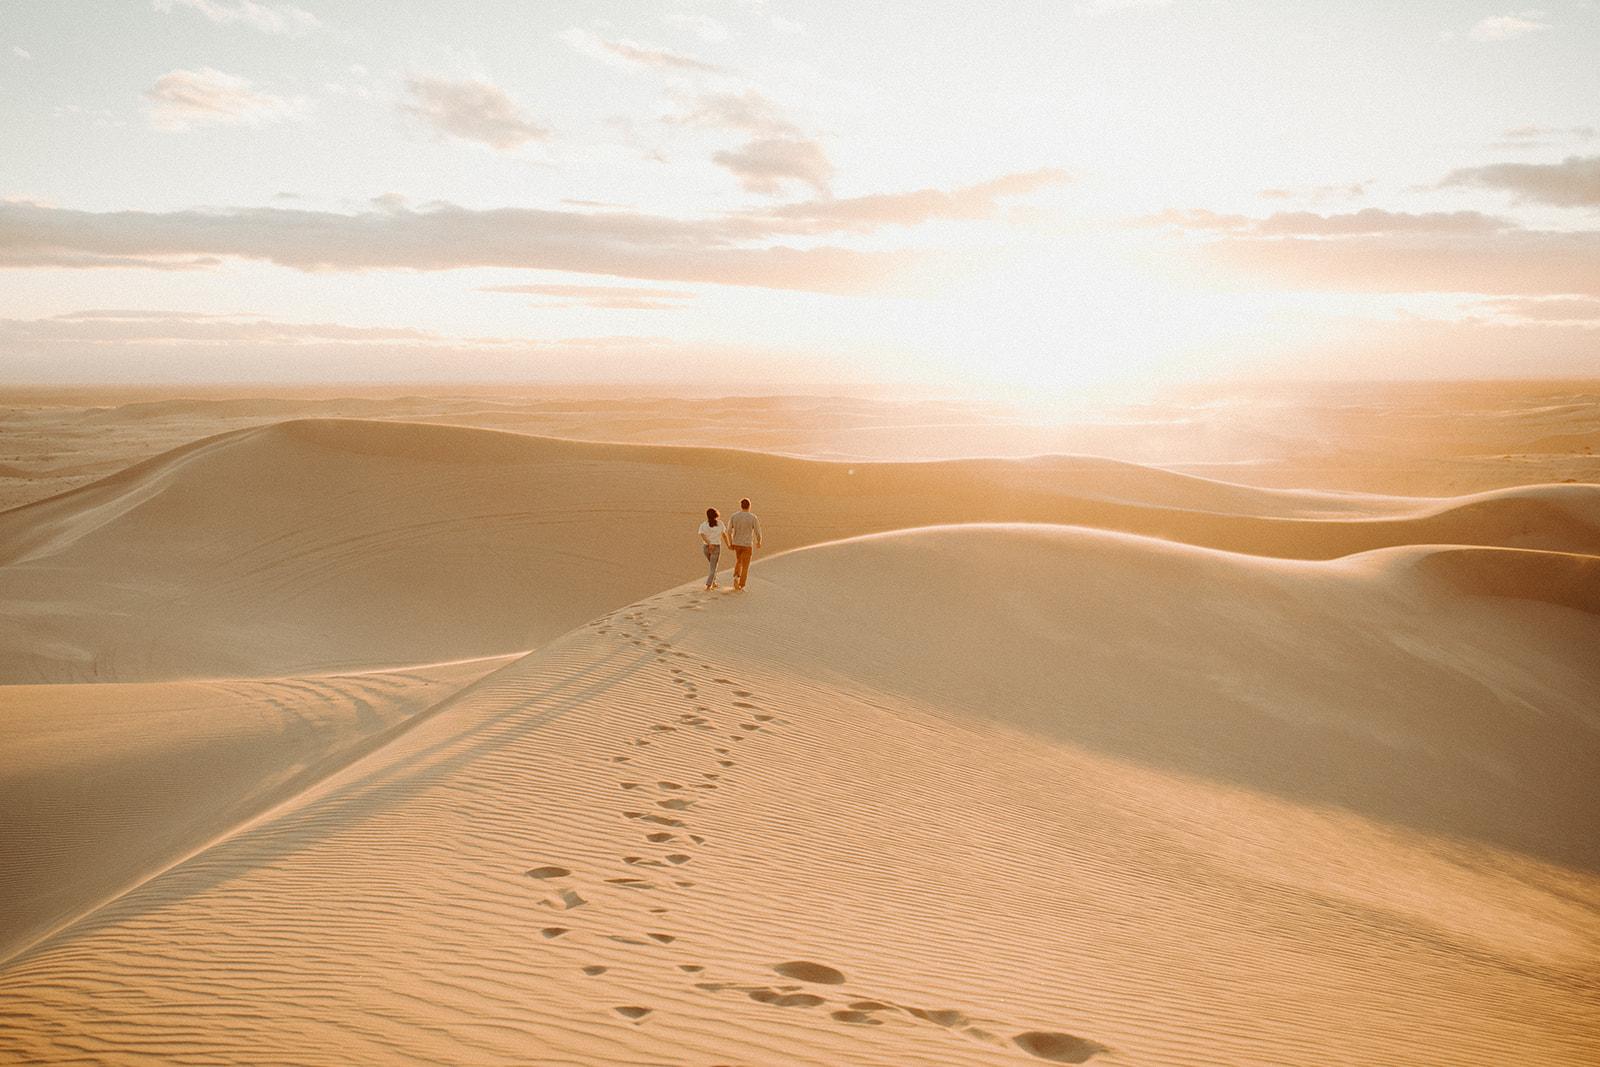 Imperial_Sand_Dunes_Linda_and_Sam_Dawn_Charles_Photographer-228.jpg